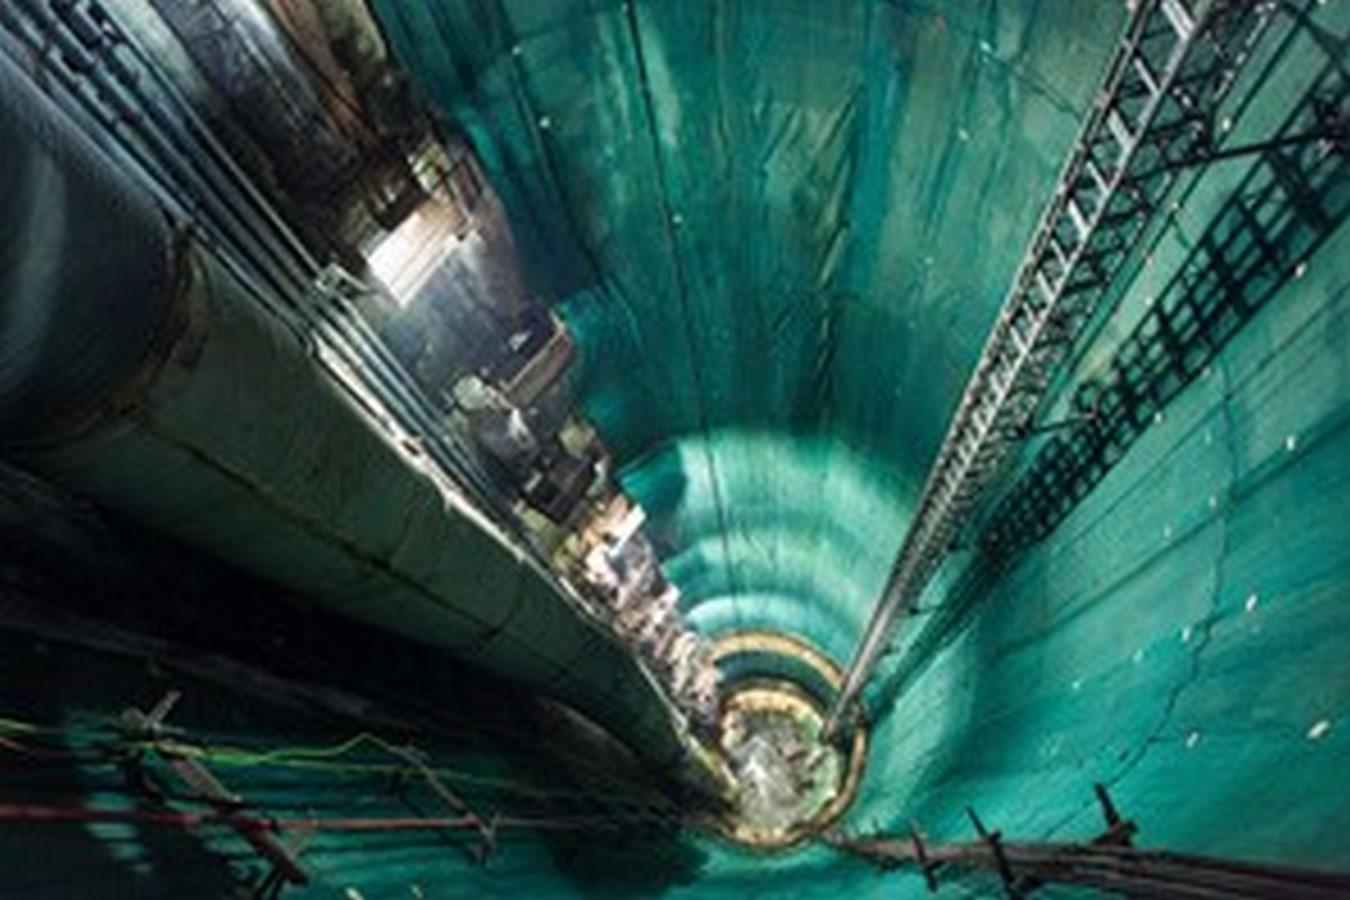 Lessons India should adopt from Hong Kong's sewage system - Sheet3